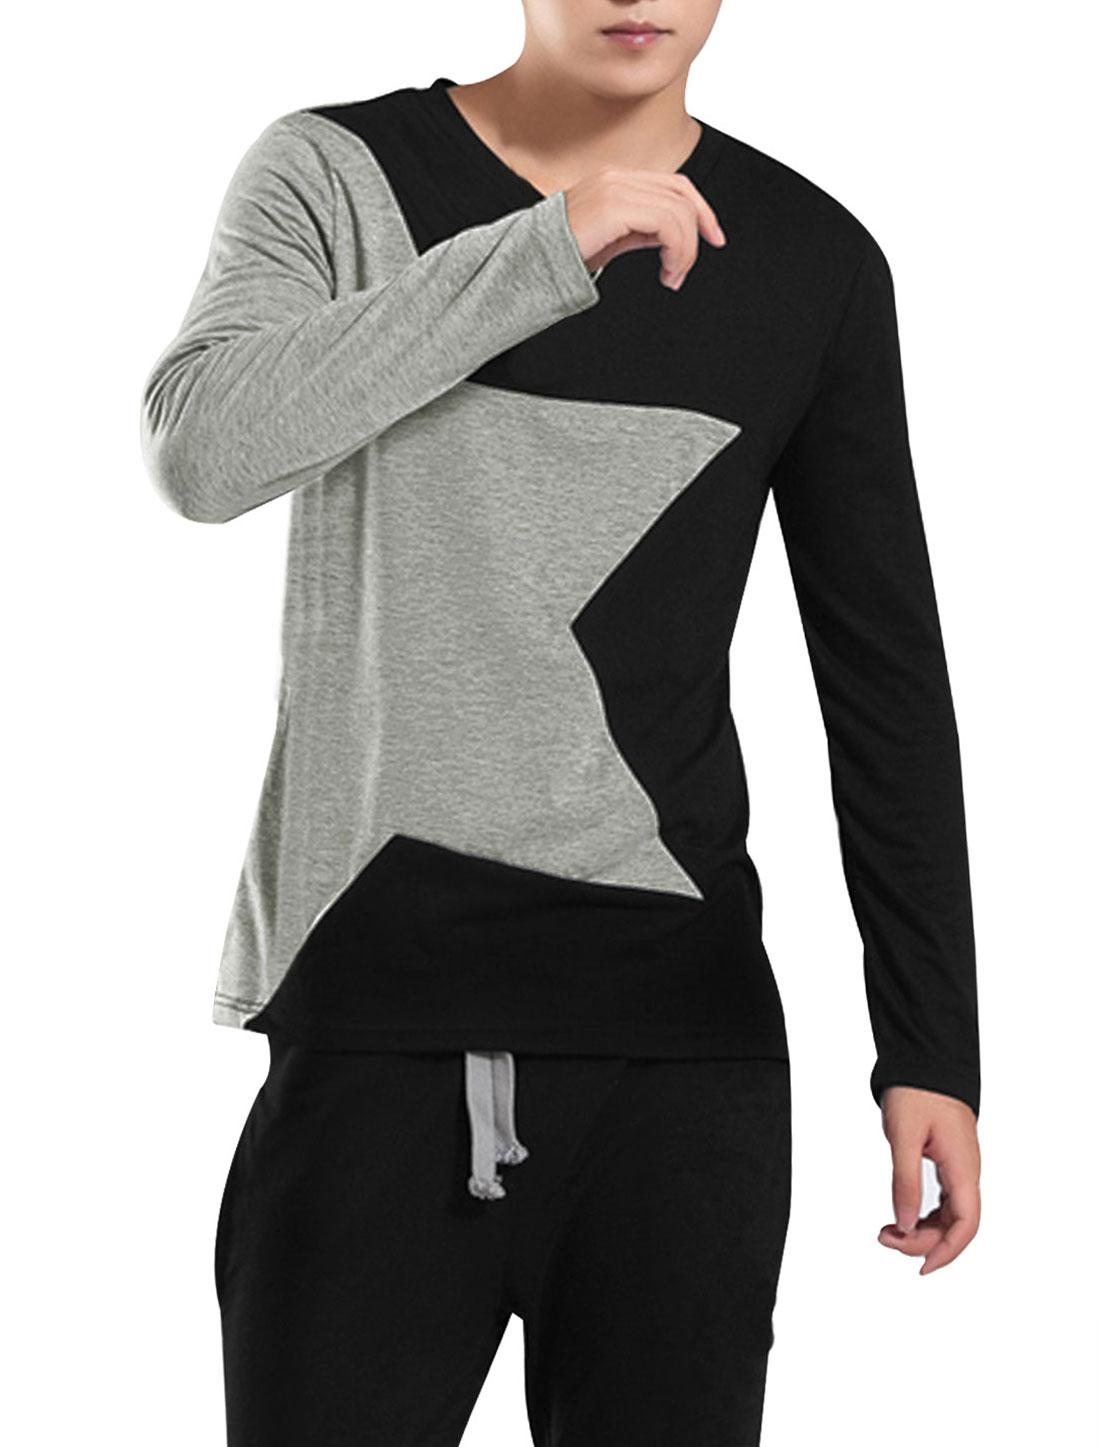 Autumn Slim Pullover Two-Tone Shirt for Men Black Light Gray M